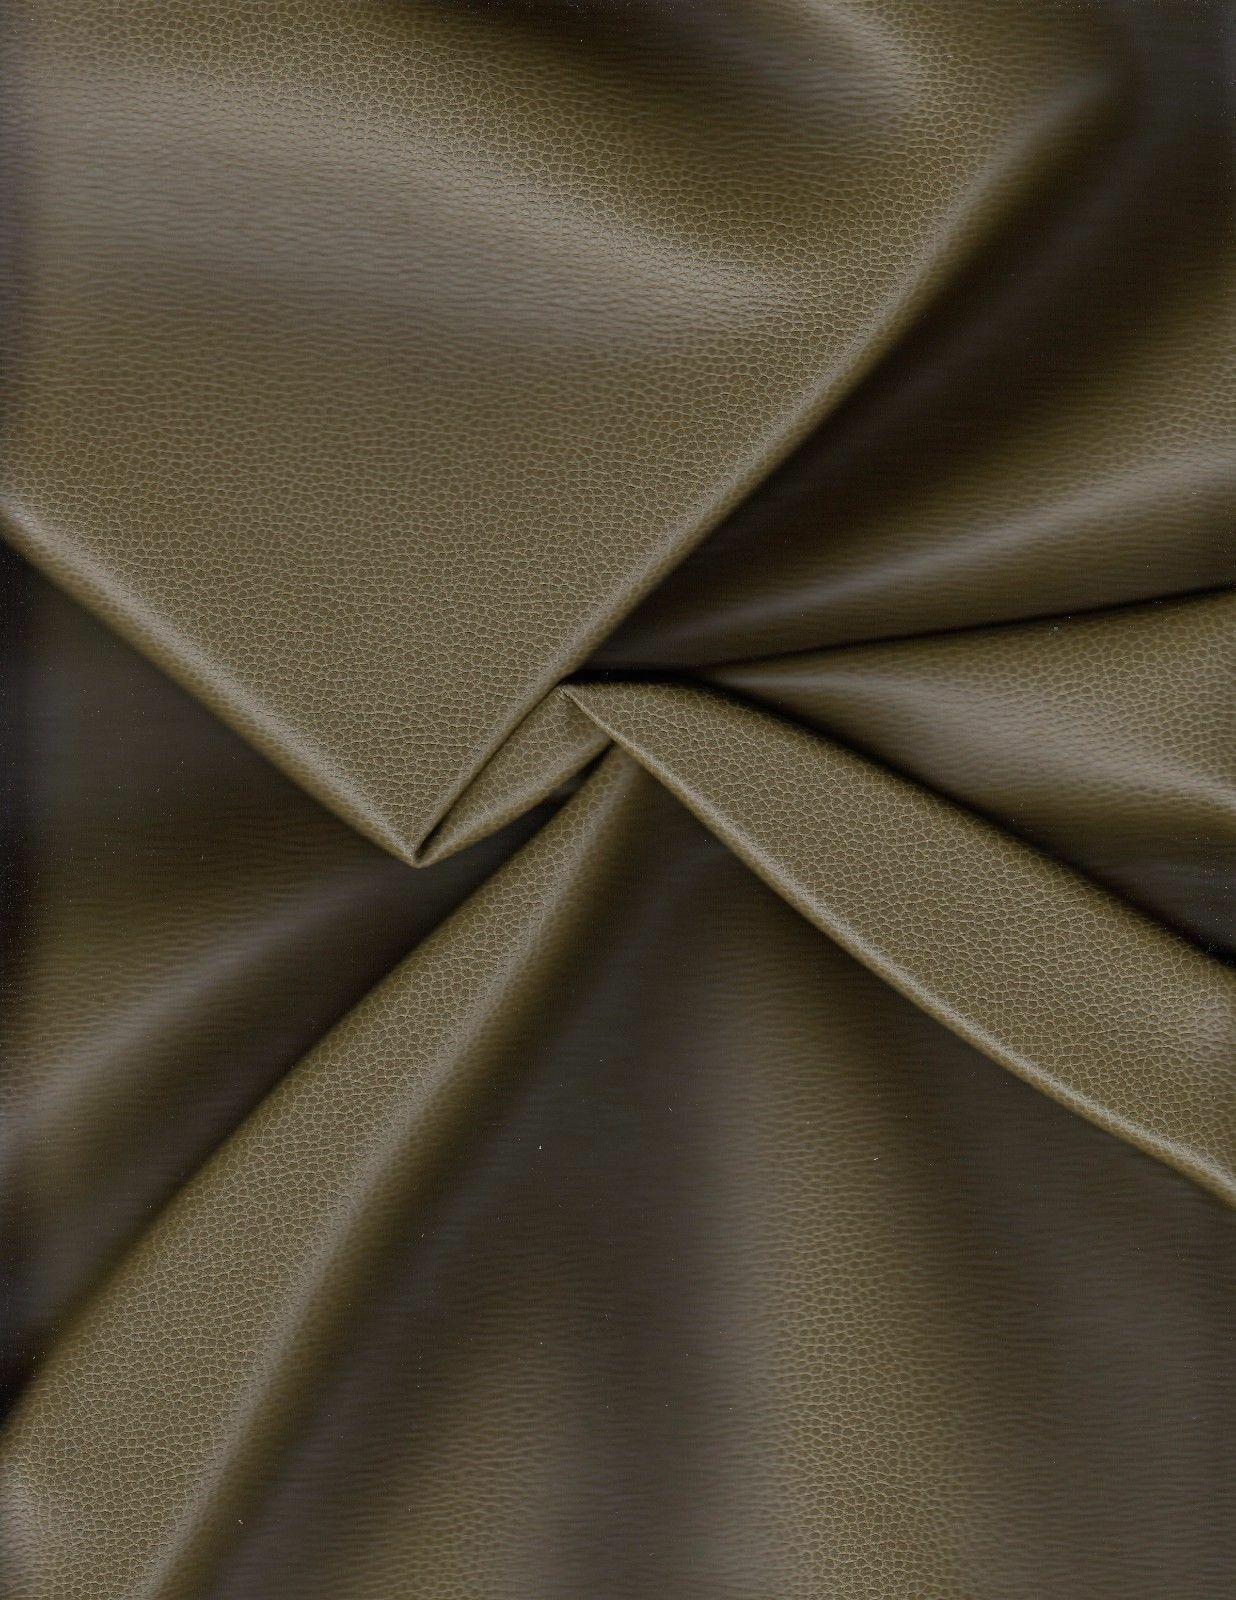 Ultrafabrics Tappezzeria Similpelle 363-4514 Promessa Verde Muschio 2.7m T-49